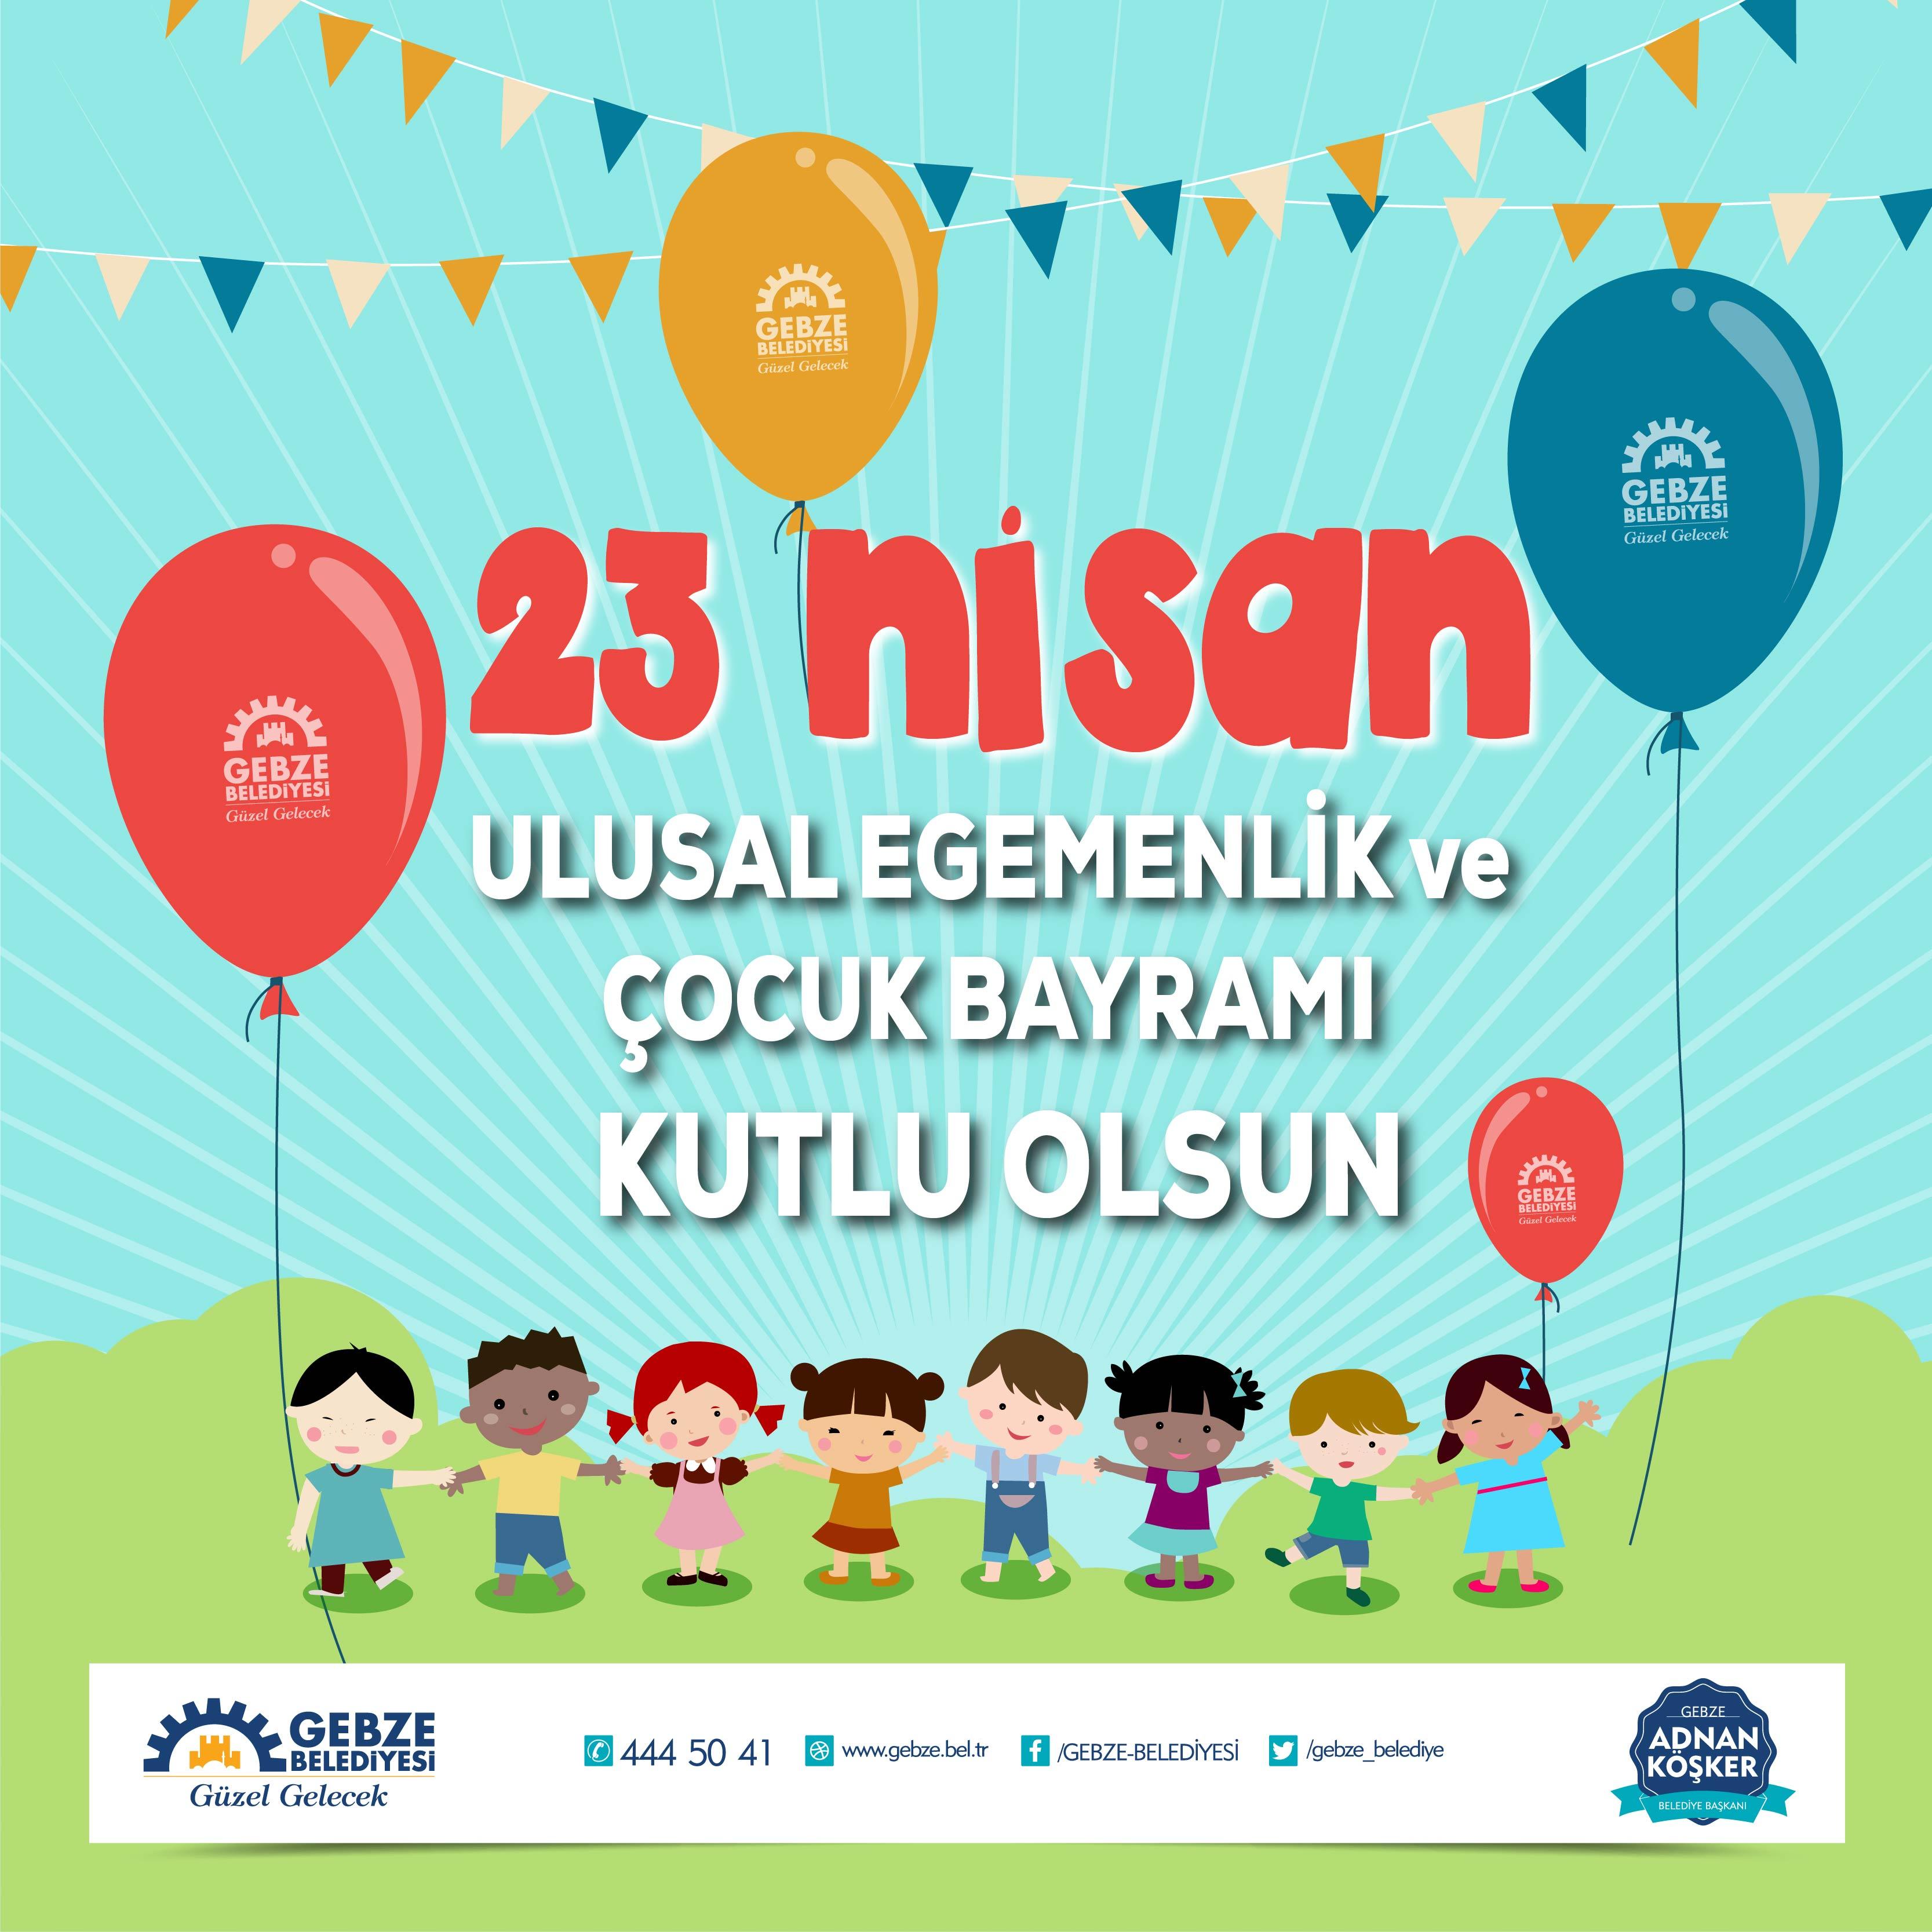 23-nisan2-01.jpg